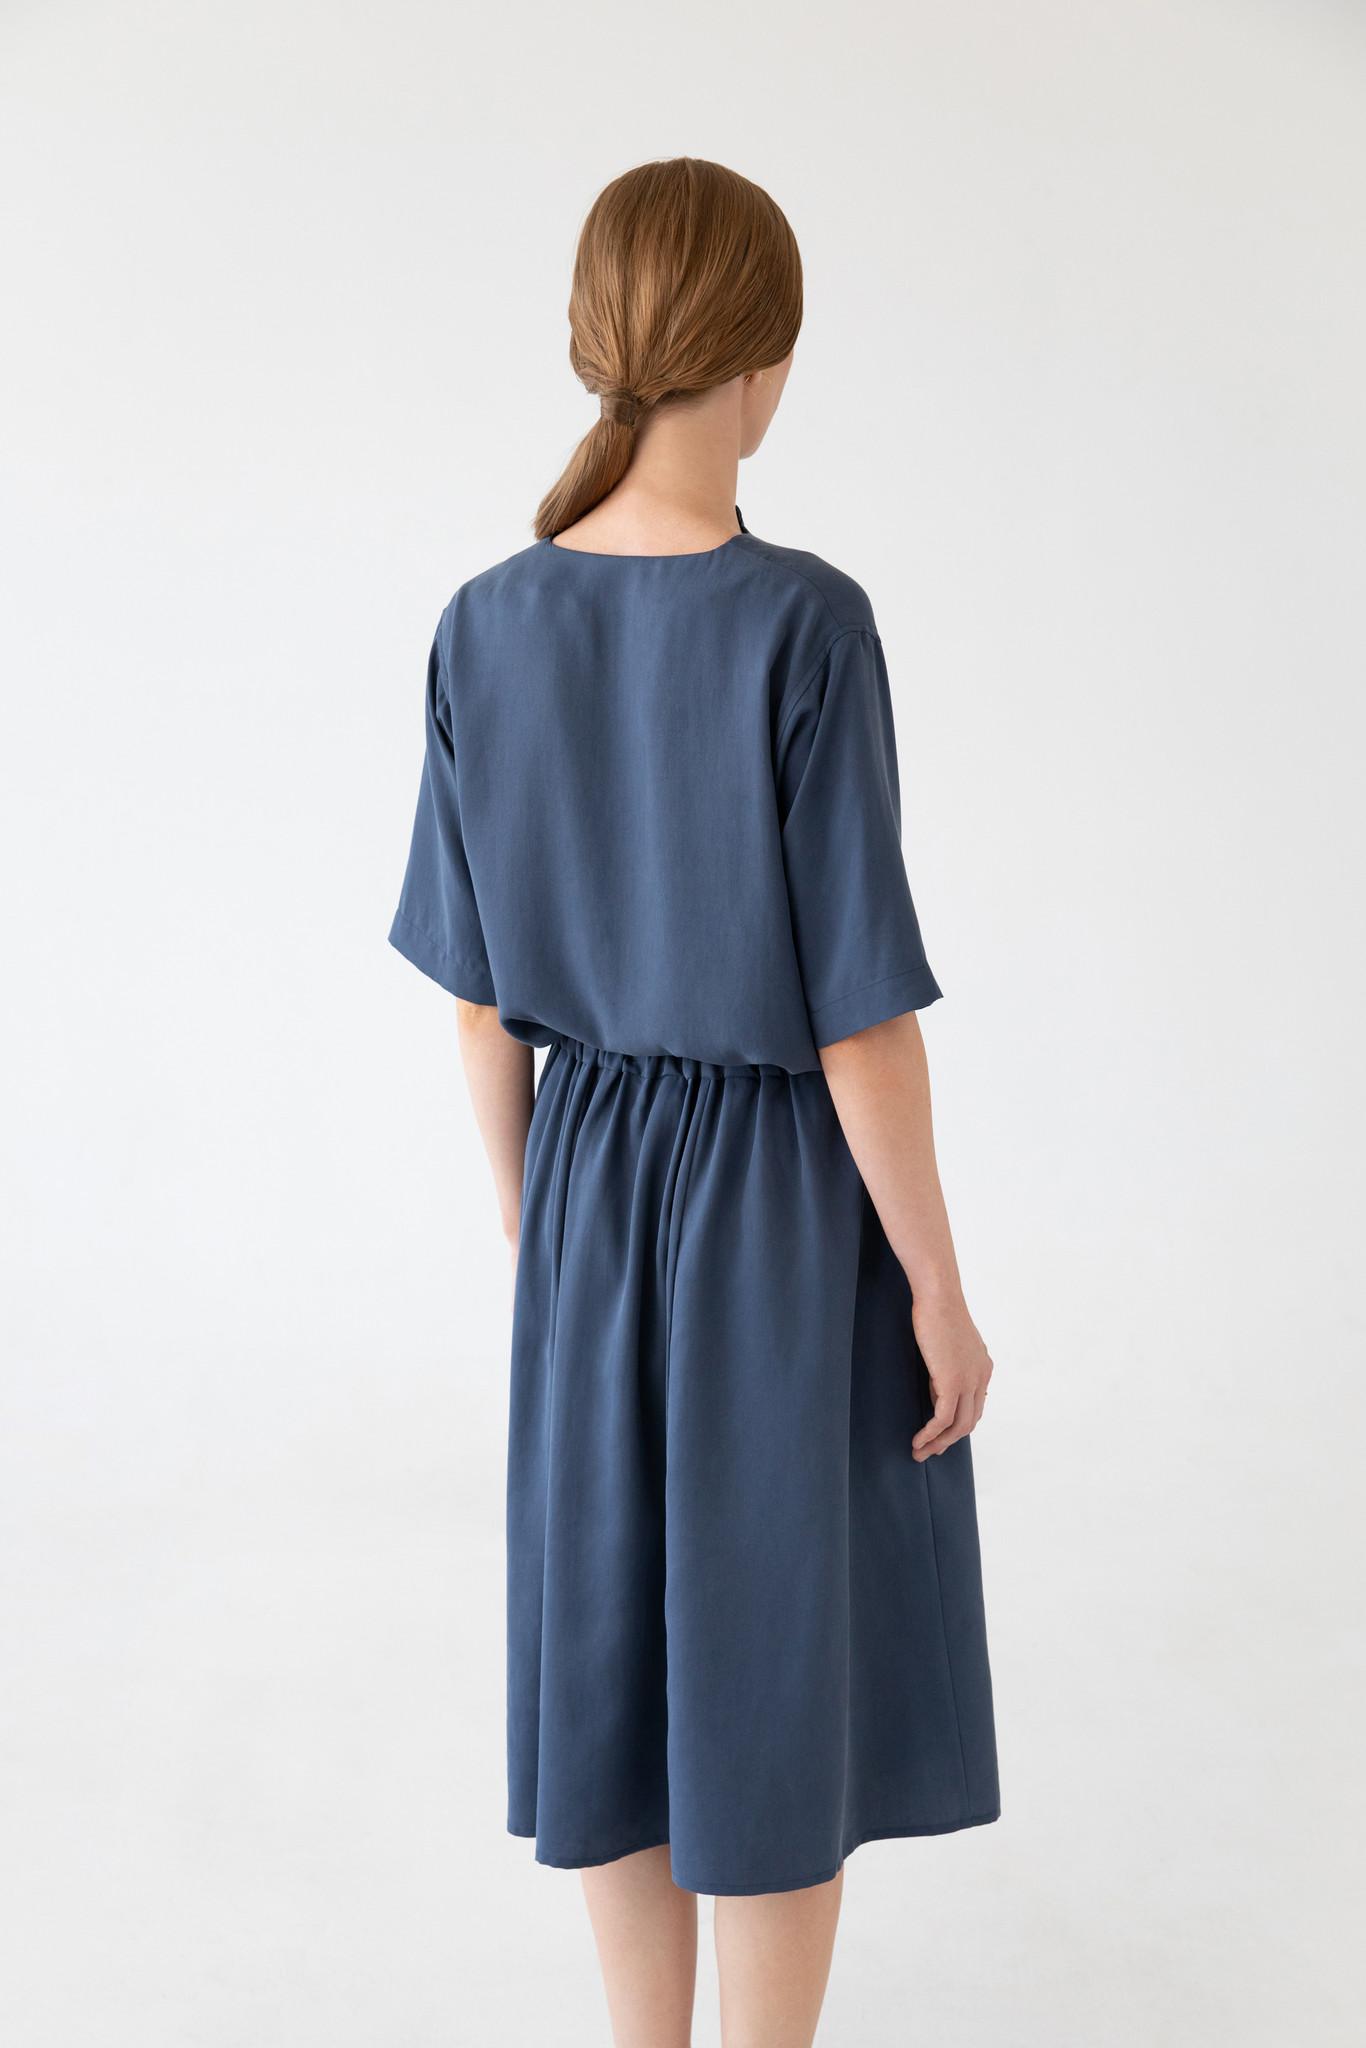 Bluse mit kurzem Arm aus Tencel - Blau-7